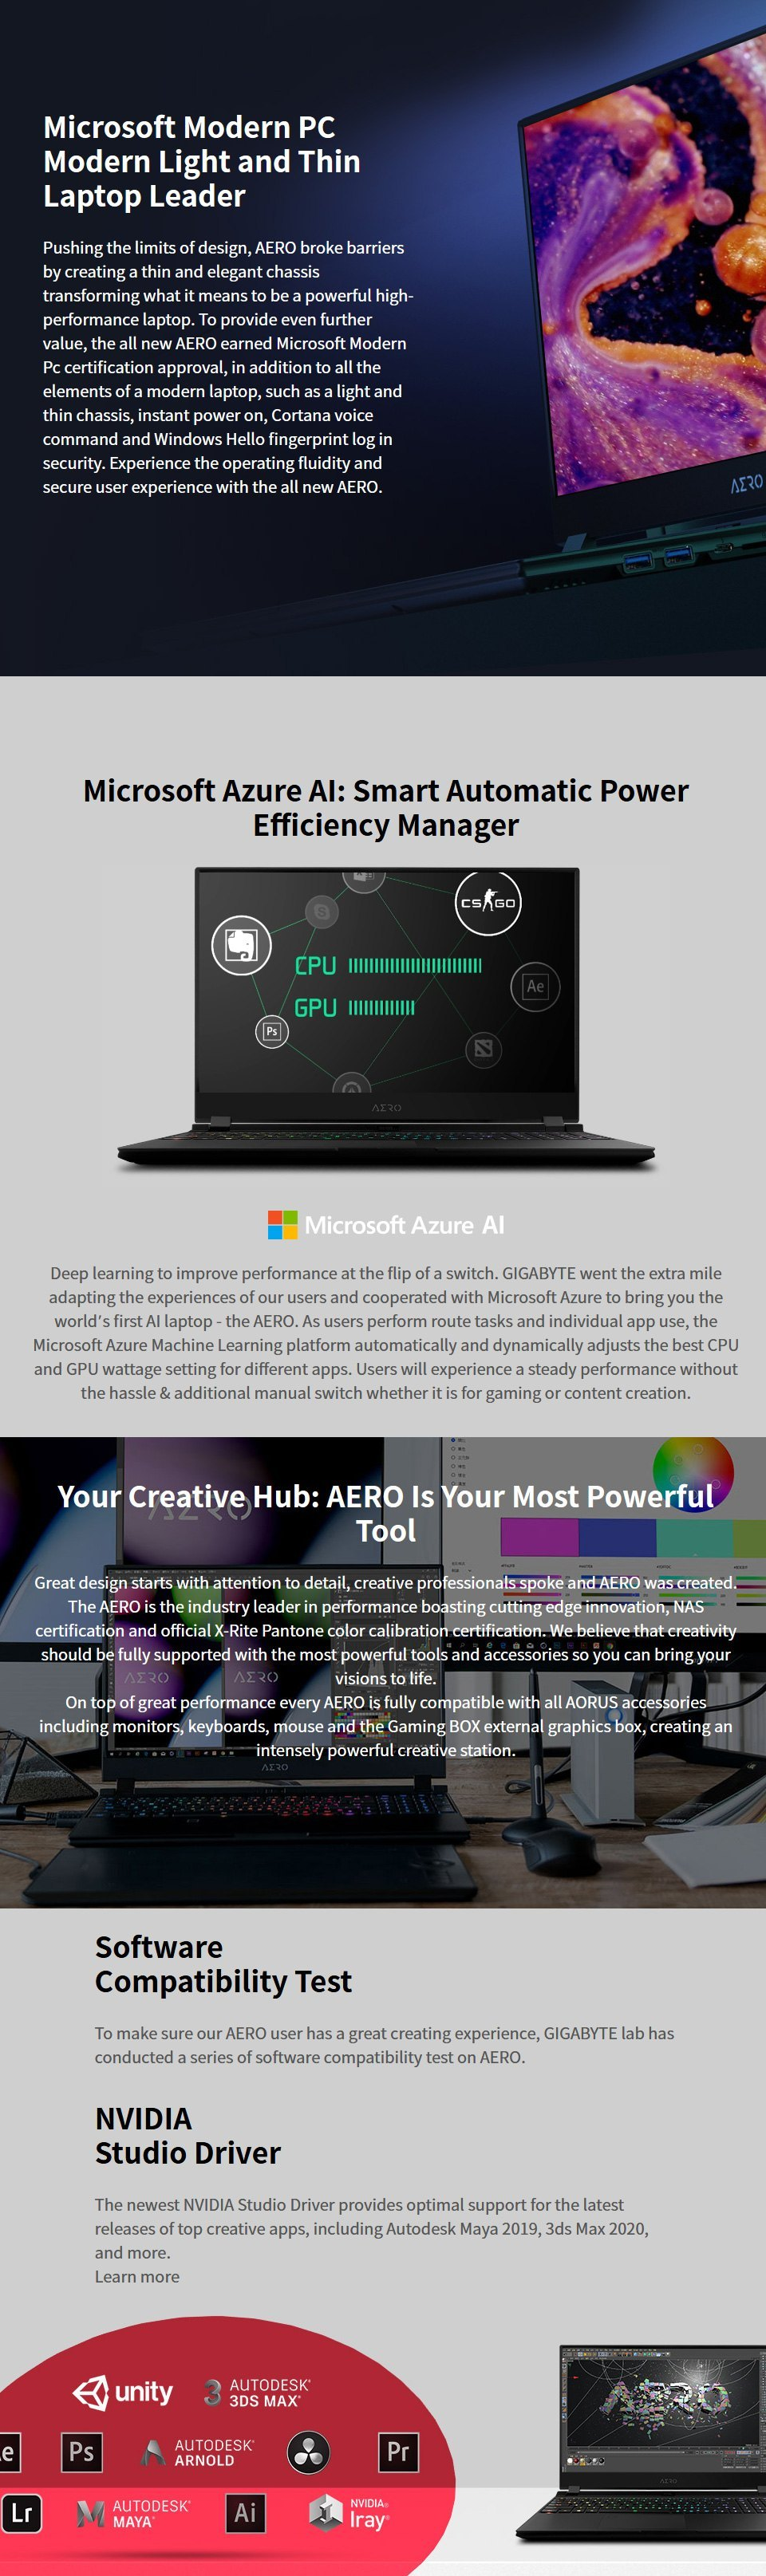 Gigabyte AERO 15 Core I7 RTX 2070 Super 15.6in OLED UHD Laptop features 4